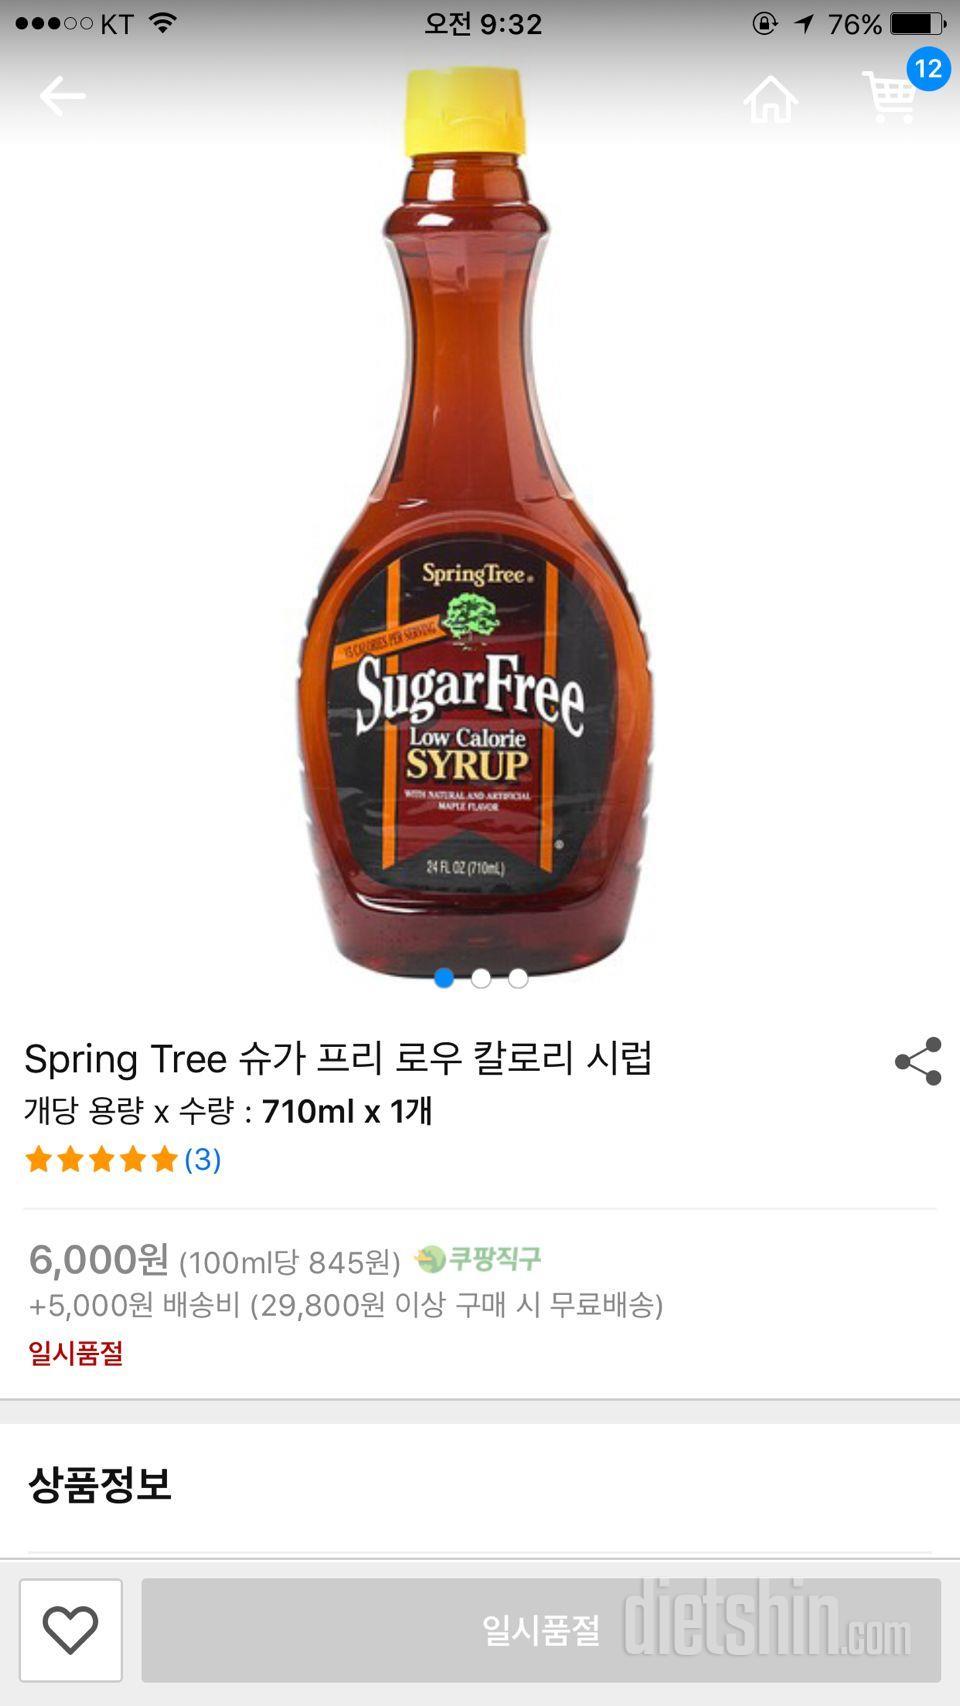 ❤⭐️ 프로틴팬케익 (120칼로리) - 든든하고 달콤한 간식!